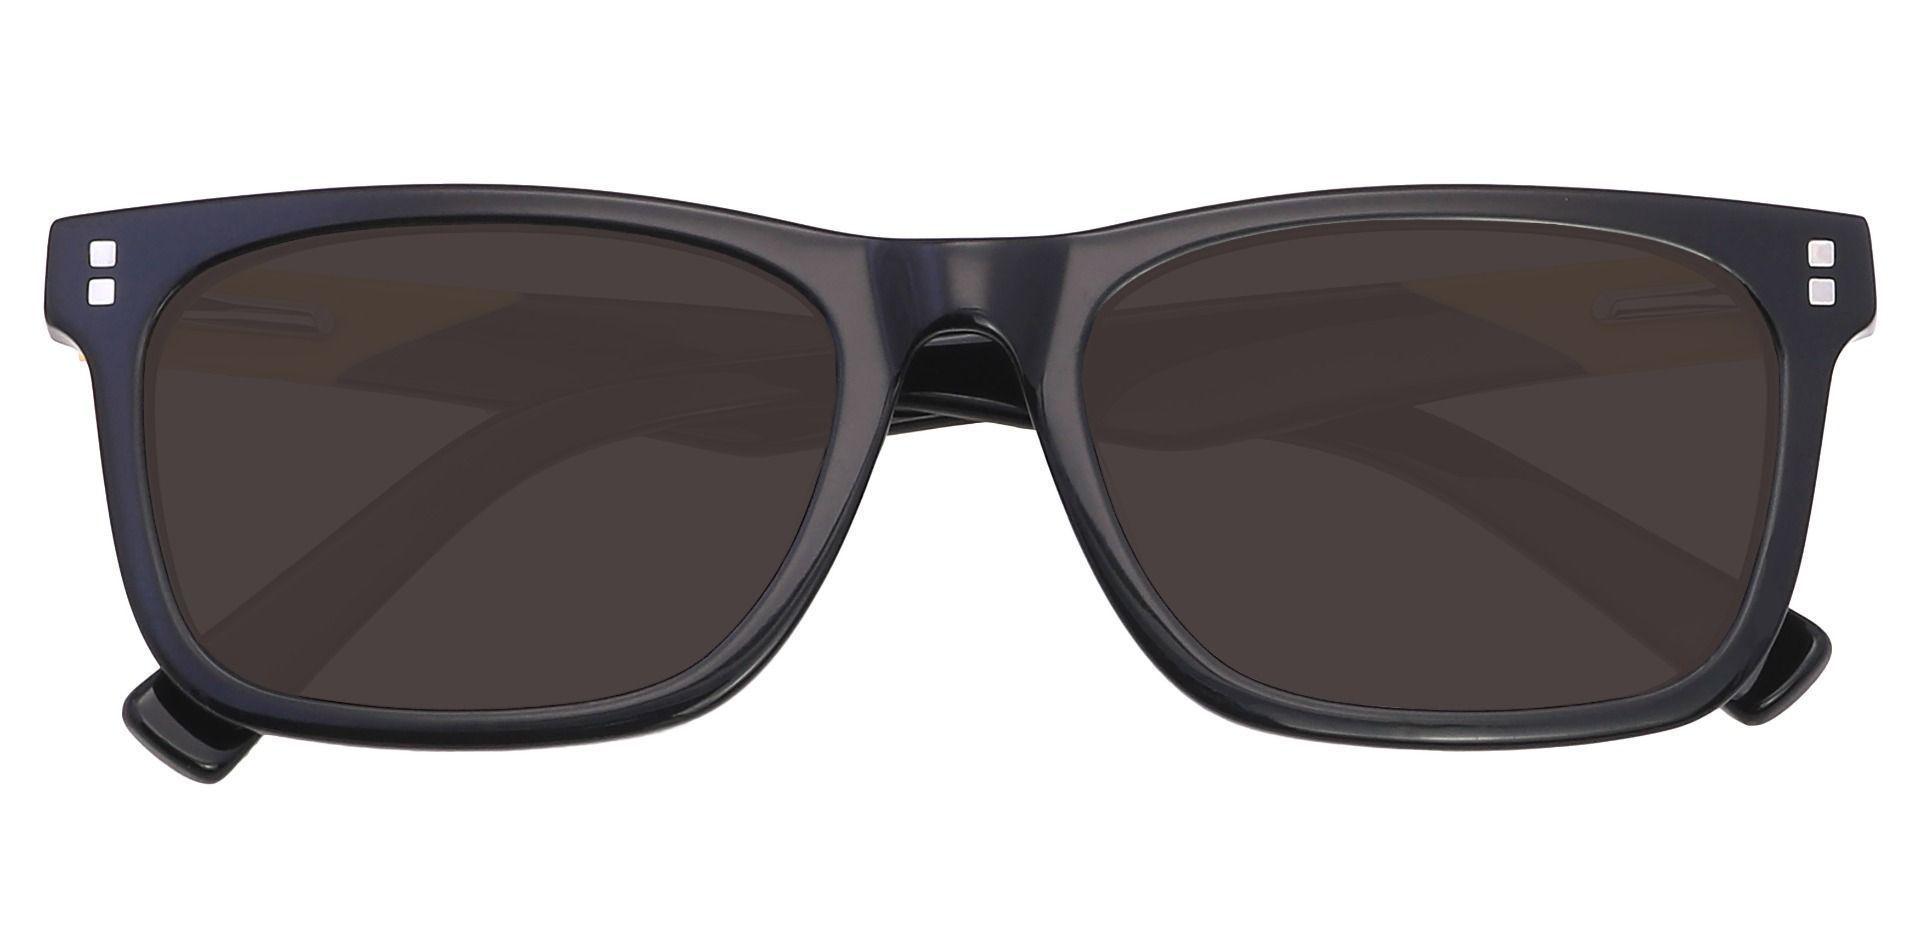 Carnegie Rectangle Prescription Sunglasses - Black Frame With Gray Lenses